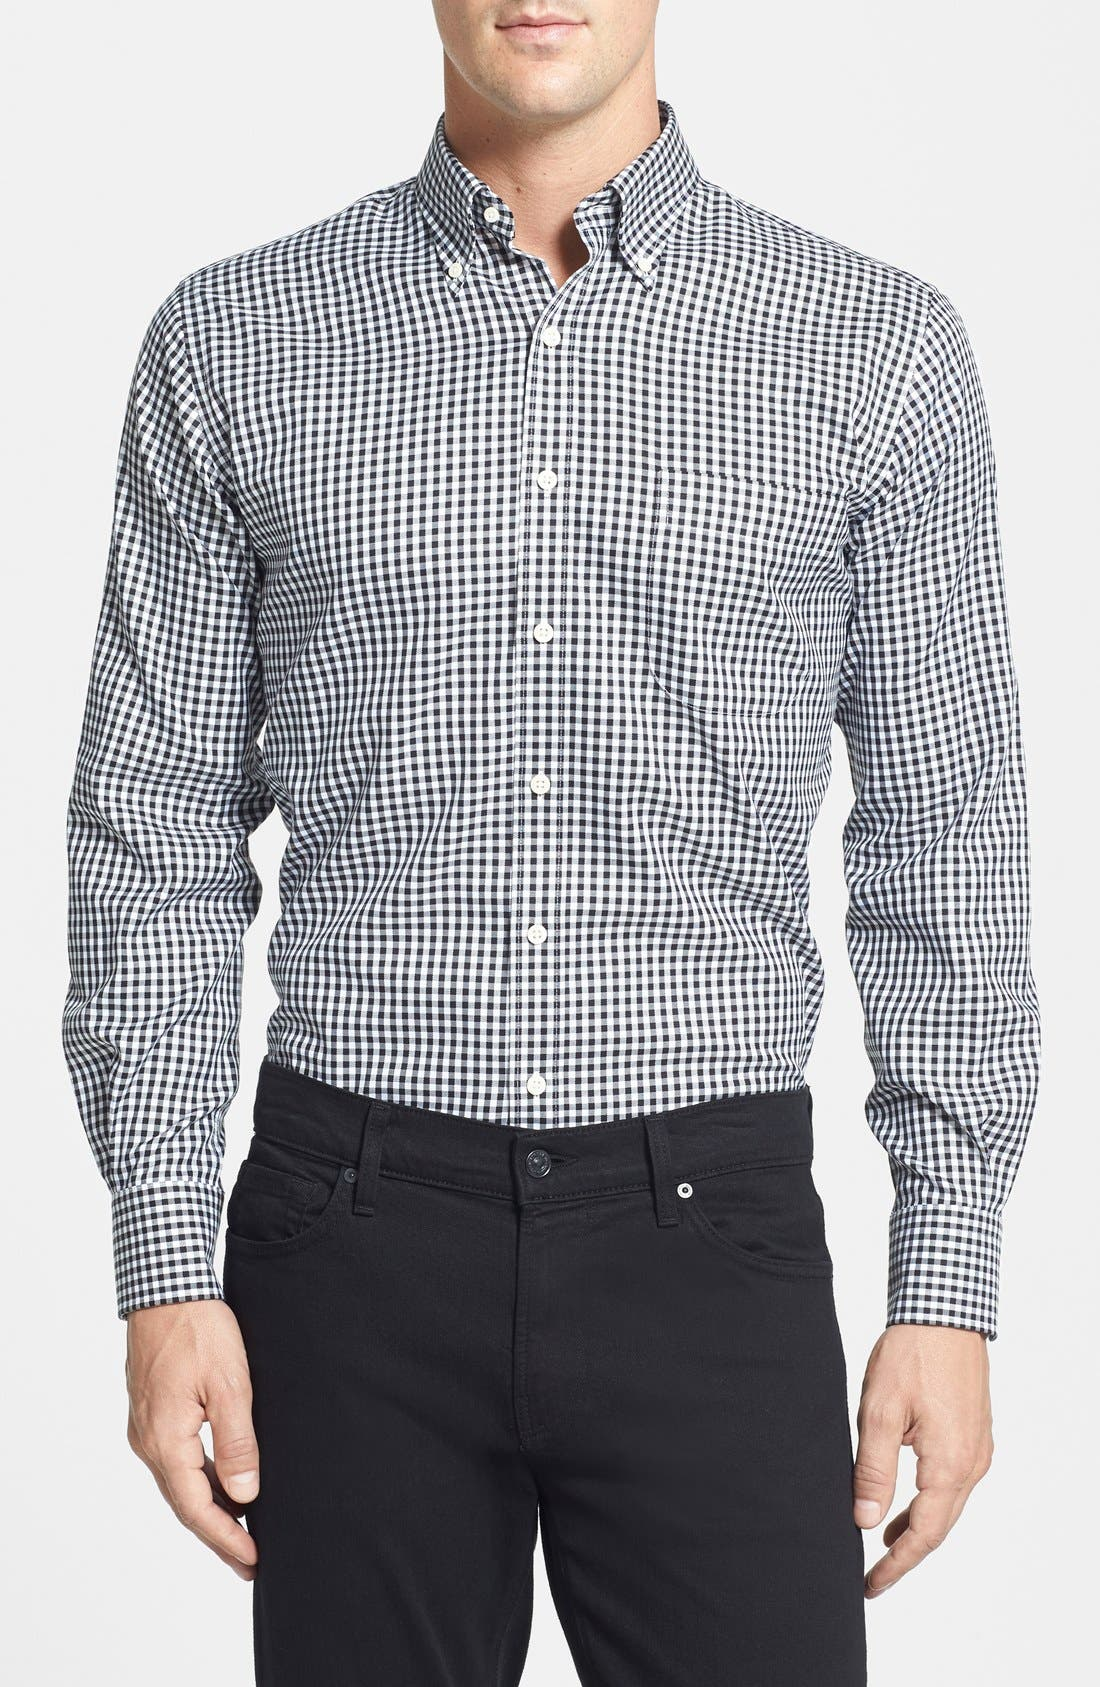 Main Image - Peter Millar 'Nanoluxe' Regular Fit Wrinkle Resistant Twill Check Sport Shirt